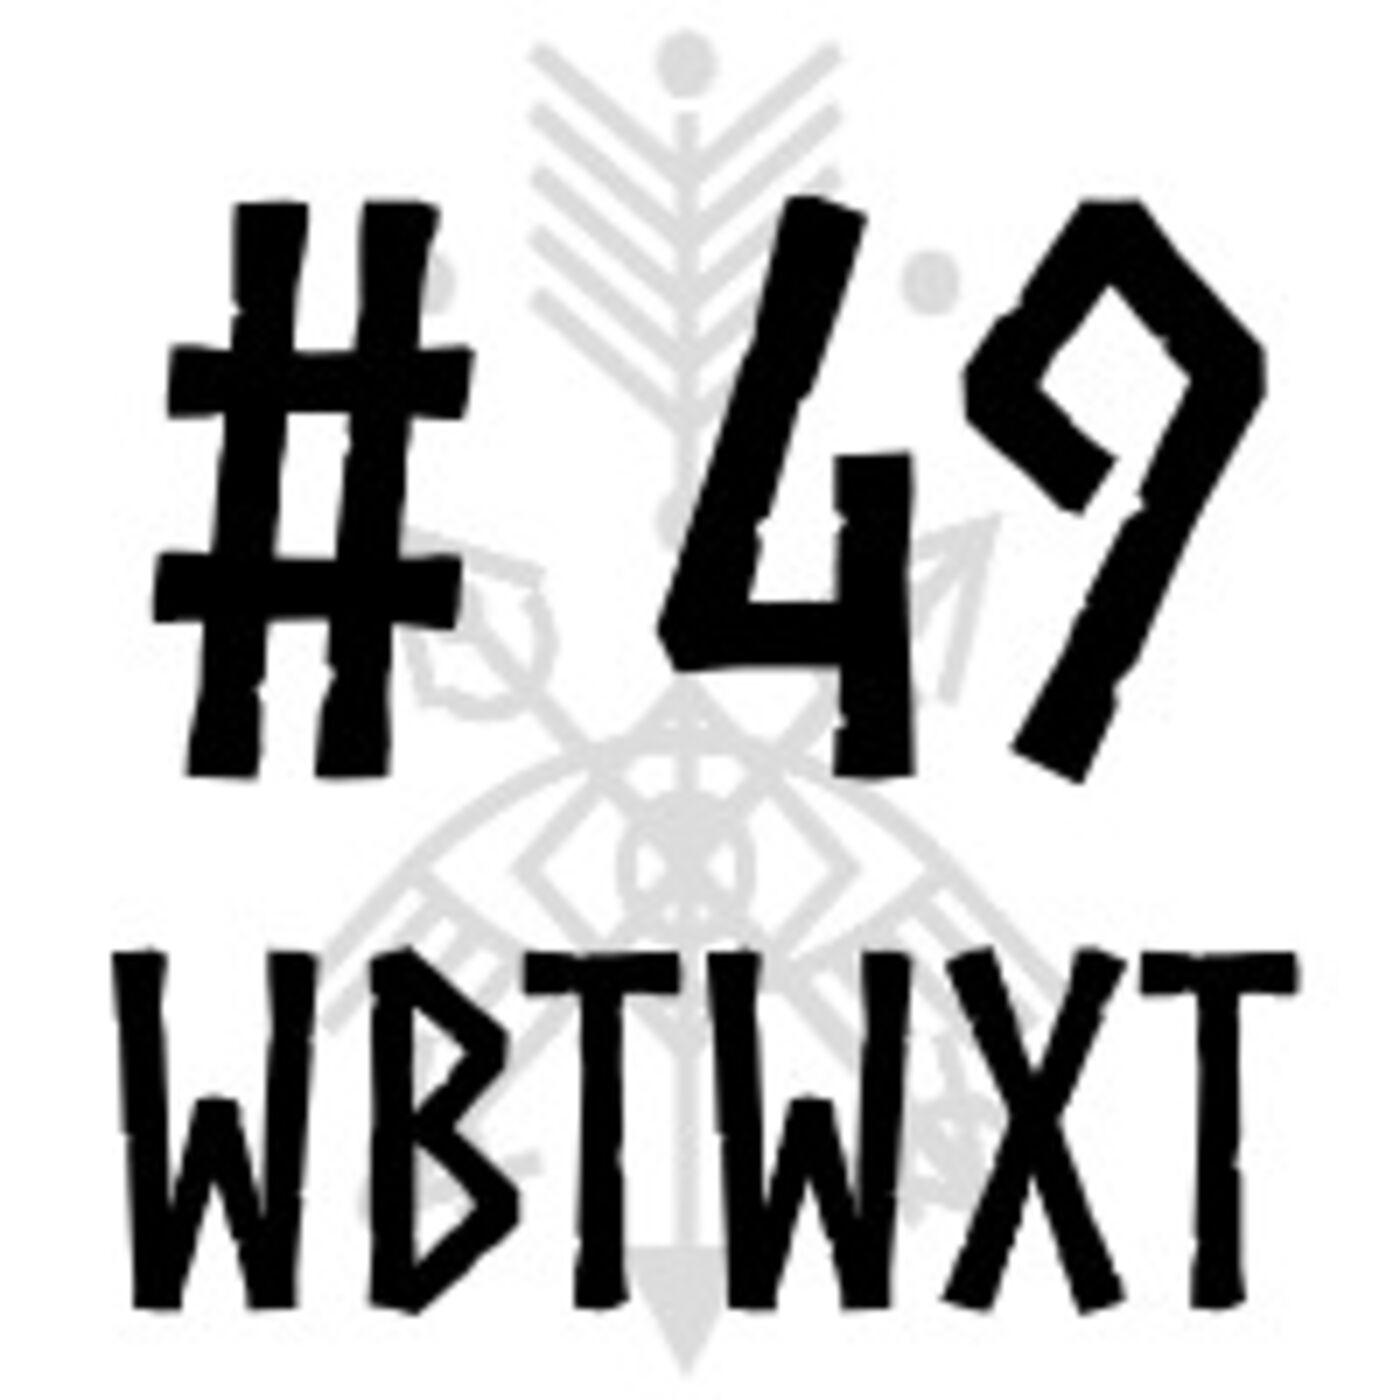 WBTWXT EP #49 - The Power of Celebration